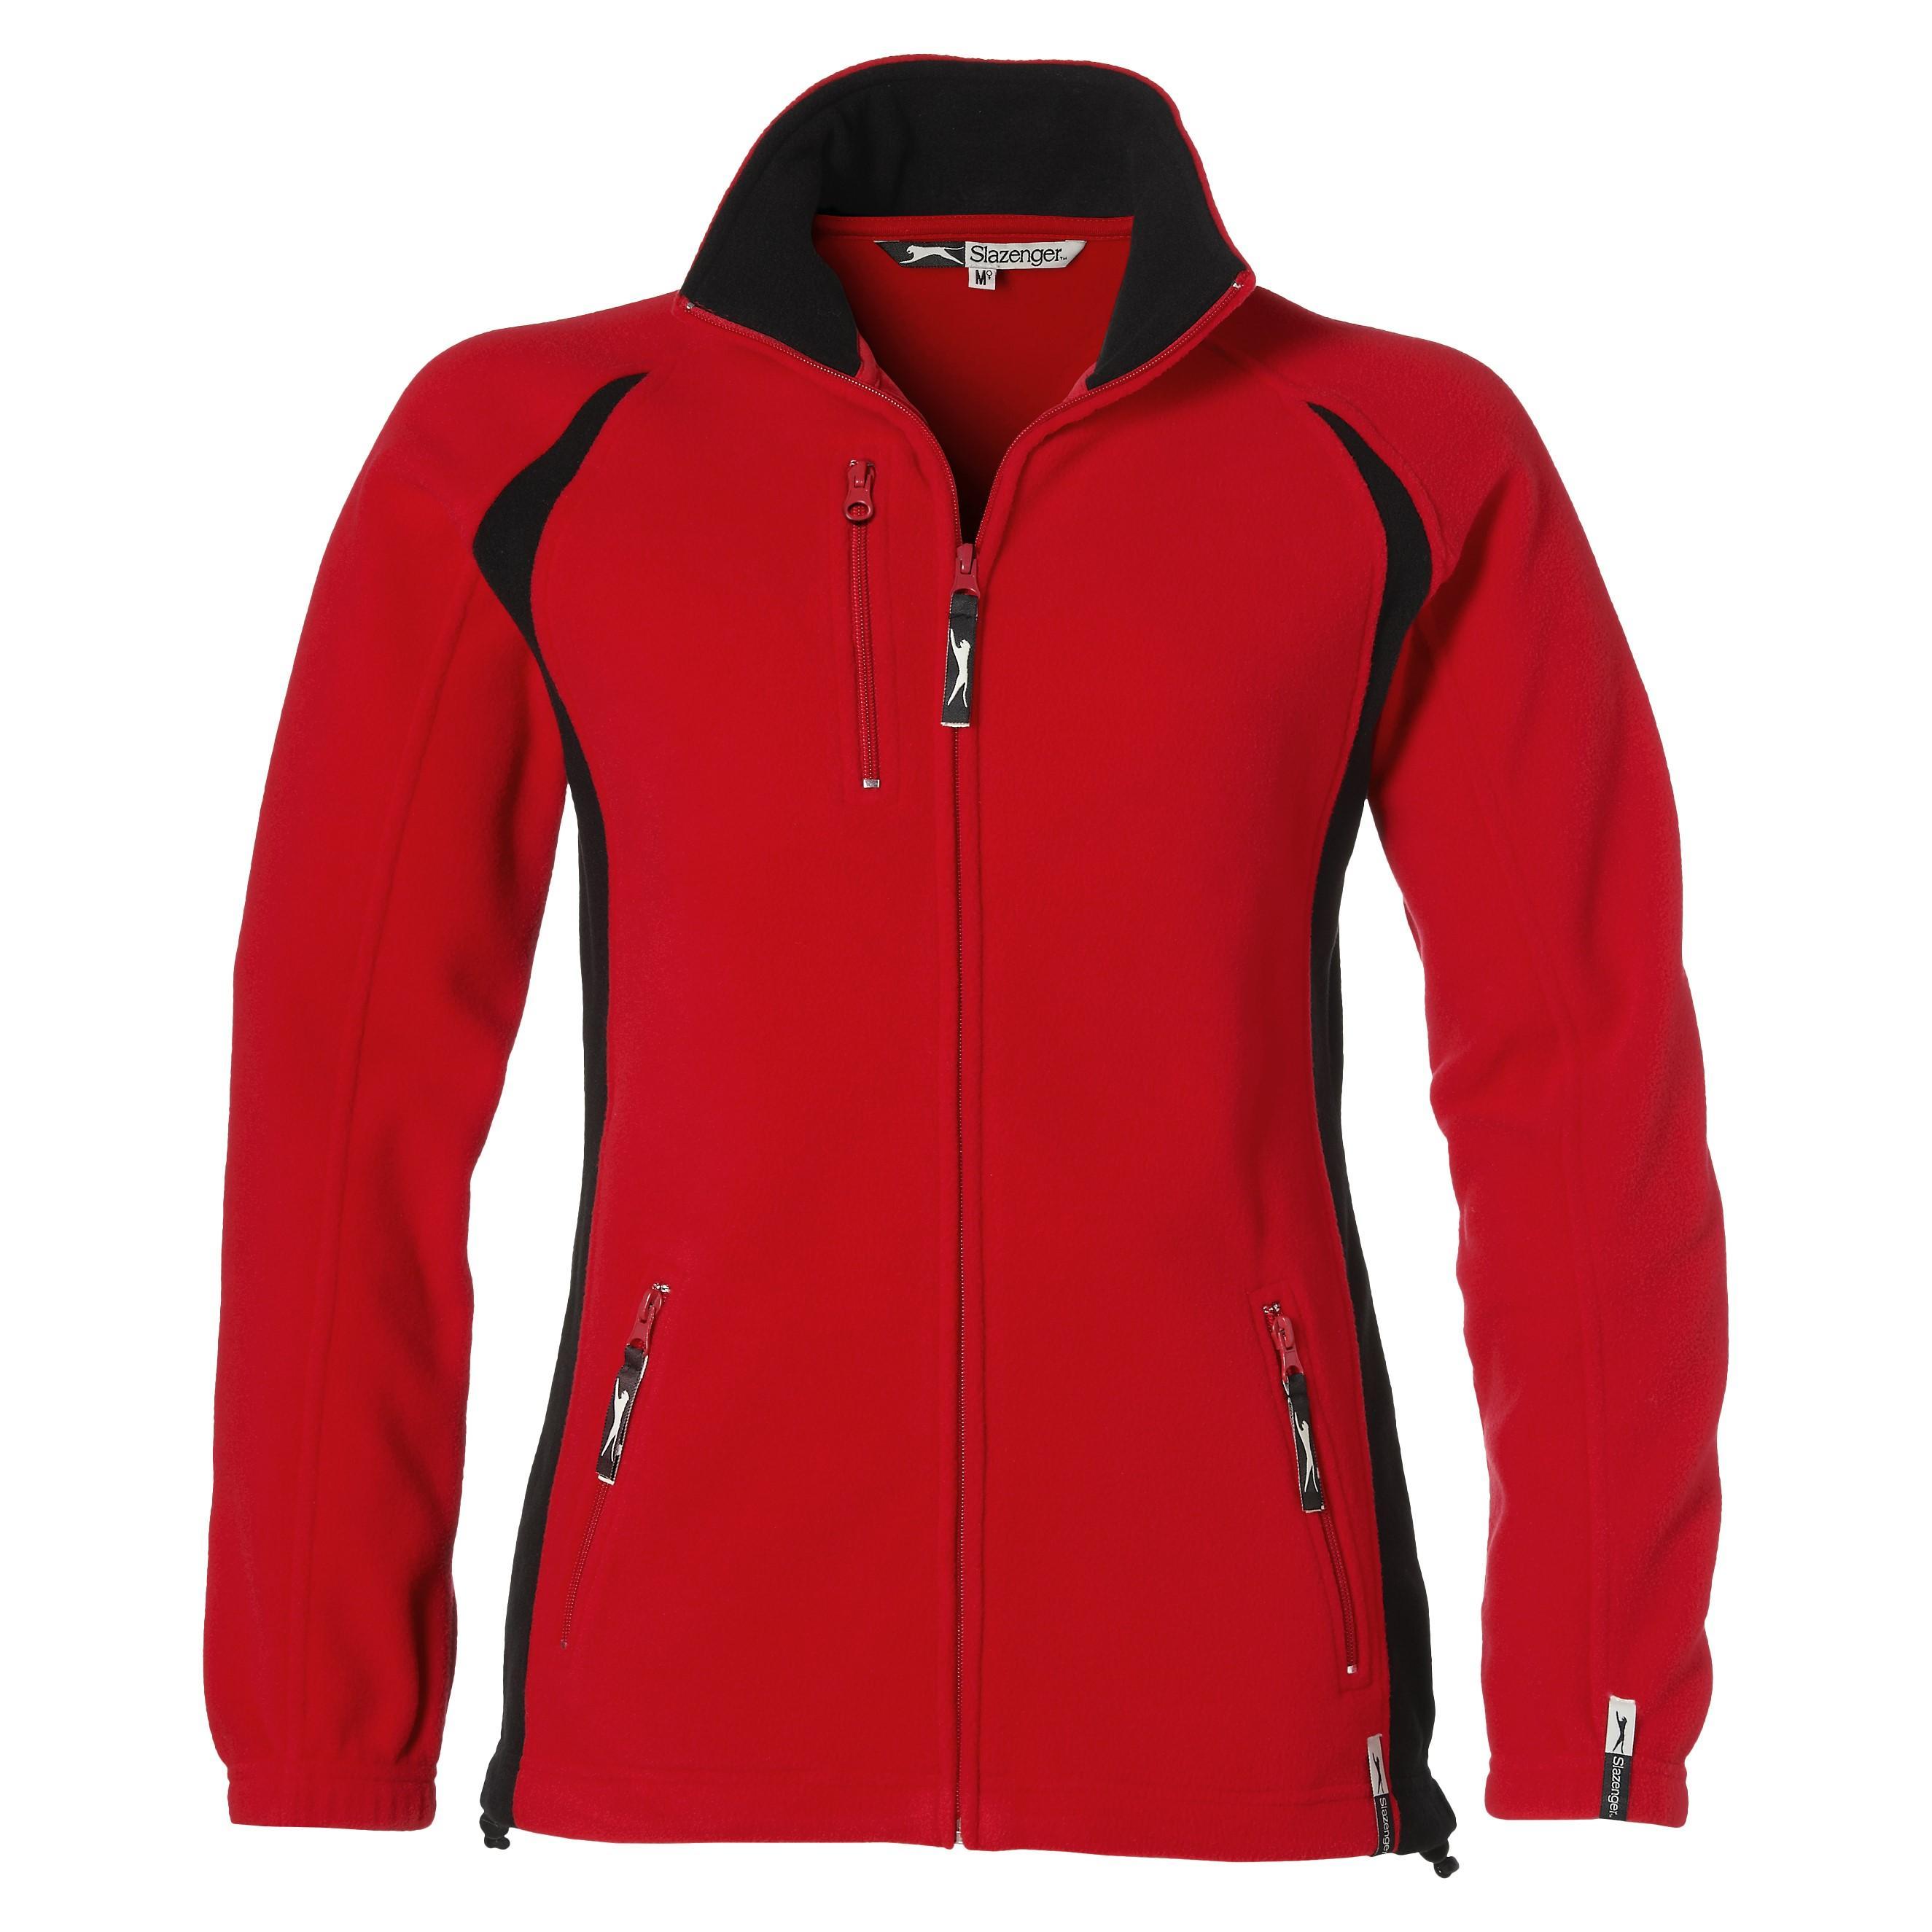 Ladies Apex Micro Fleece Jacket - Red Only